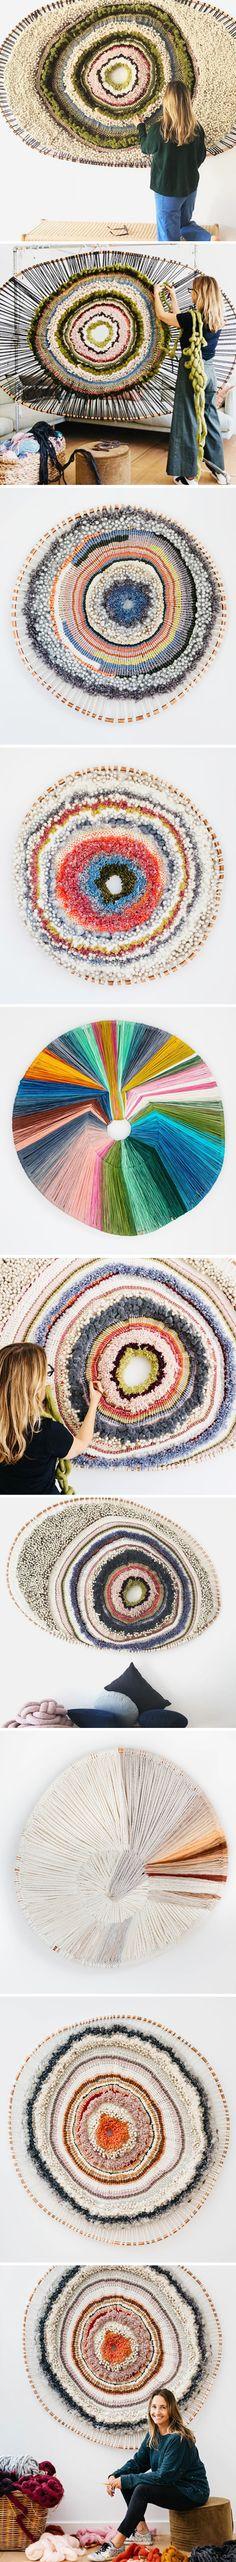 weavings by tammy kanat